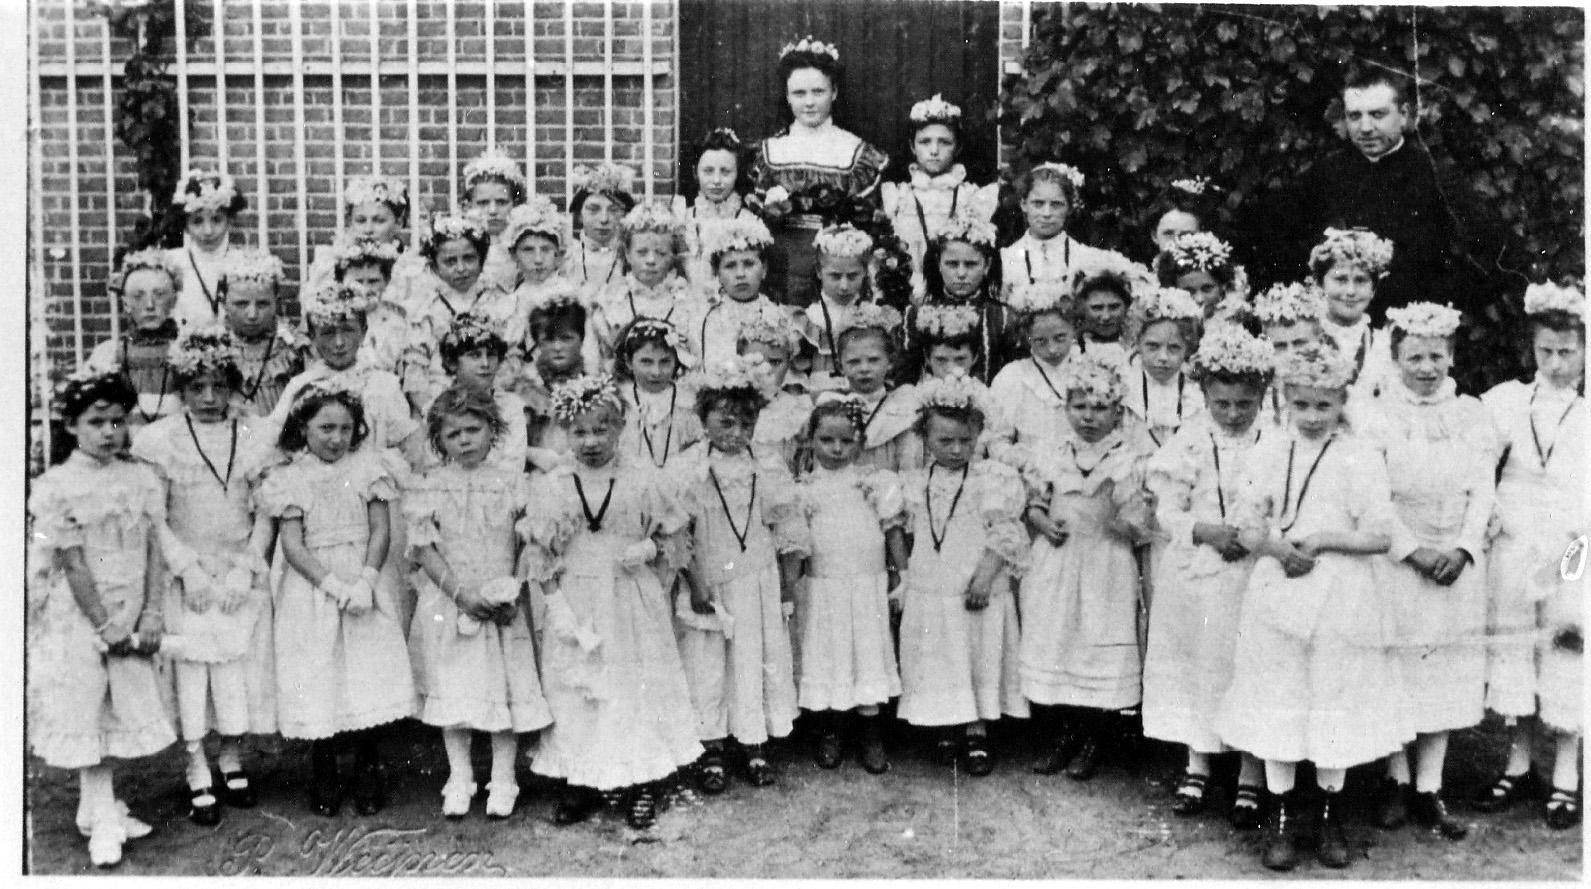 ca1901 Heilige Kindsheid processie (6-7)